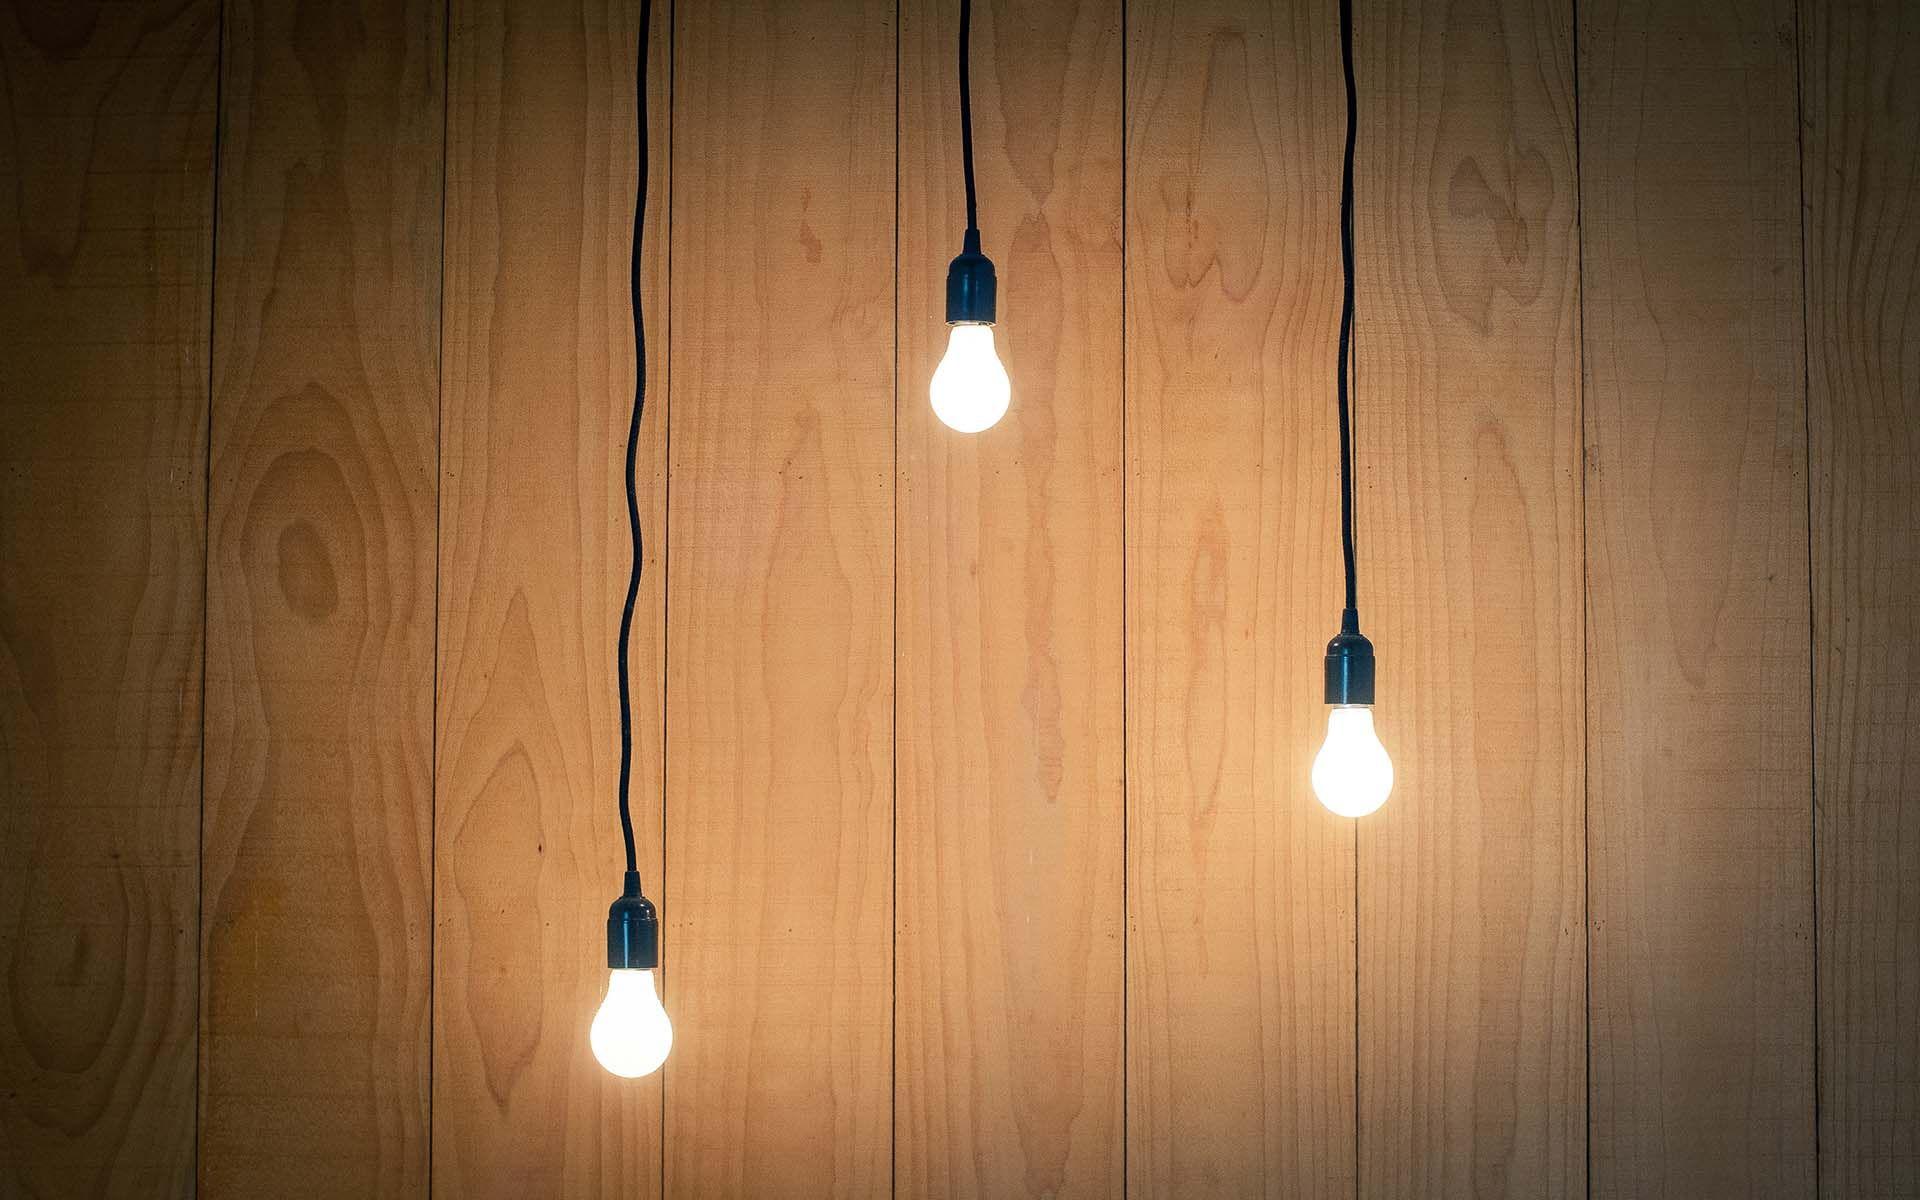 1000 images about lightbulb things on pinterest lightbulbs bulbs - Light Bulb Wallpaper 1924 1920x1200 Umad Com